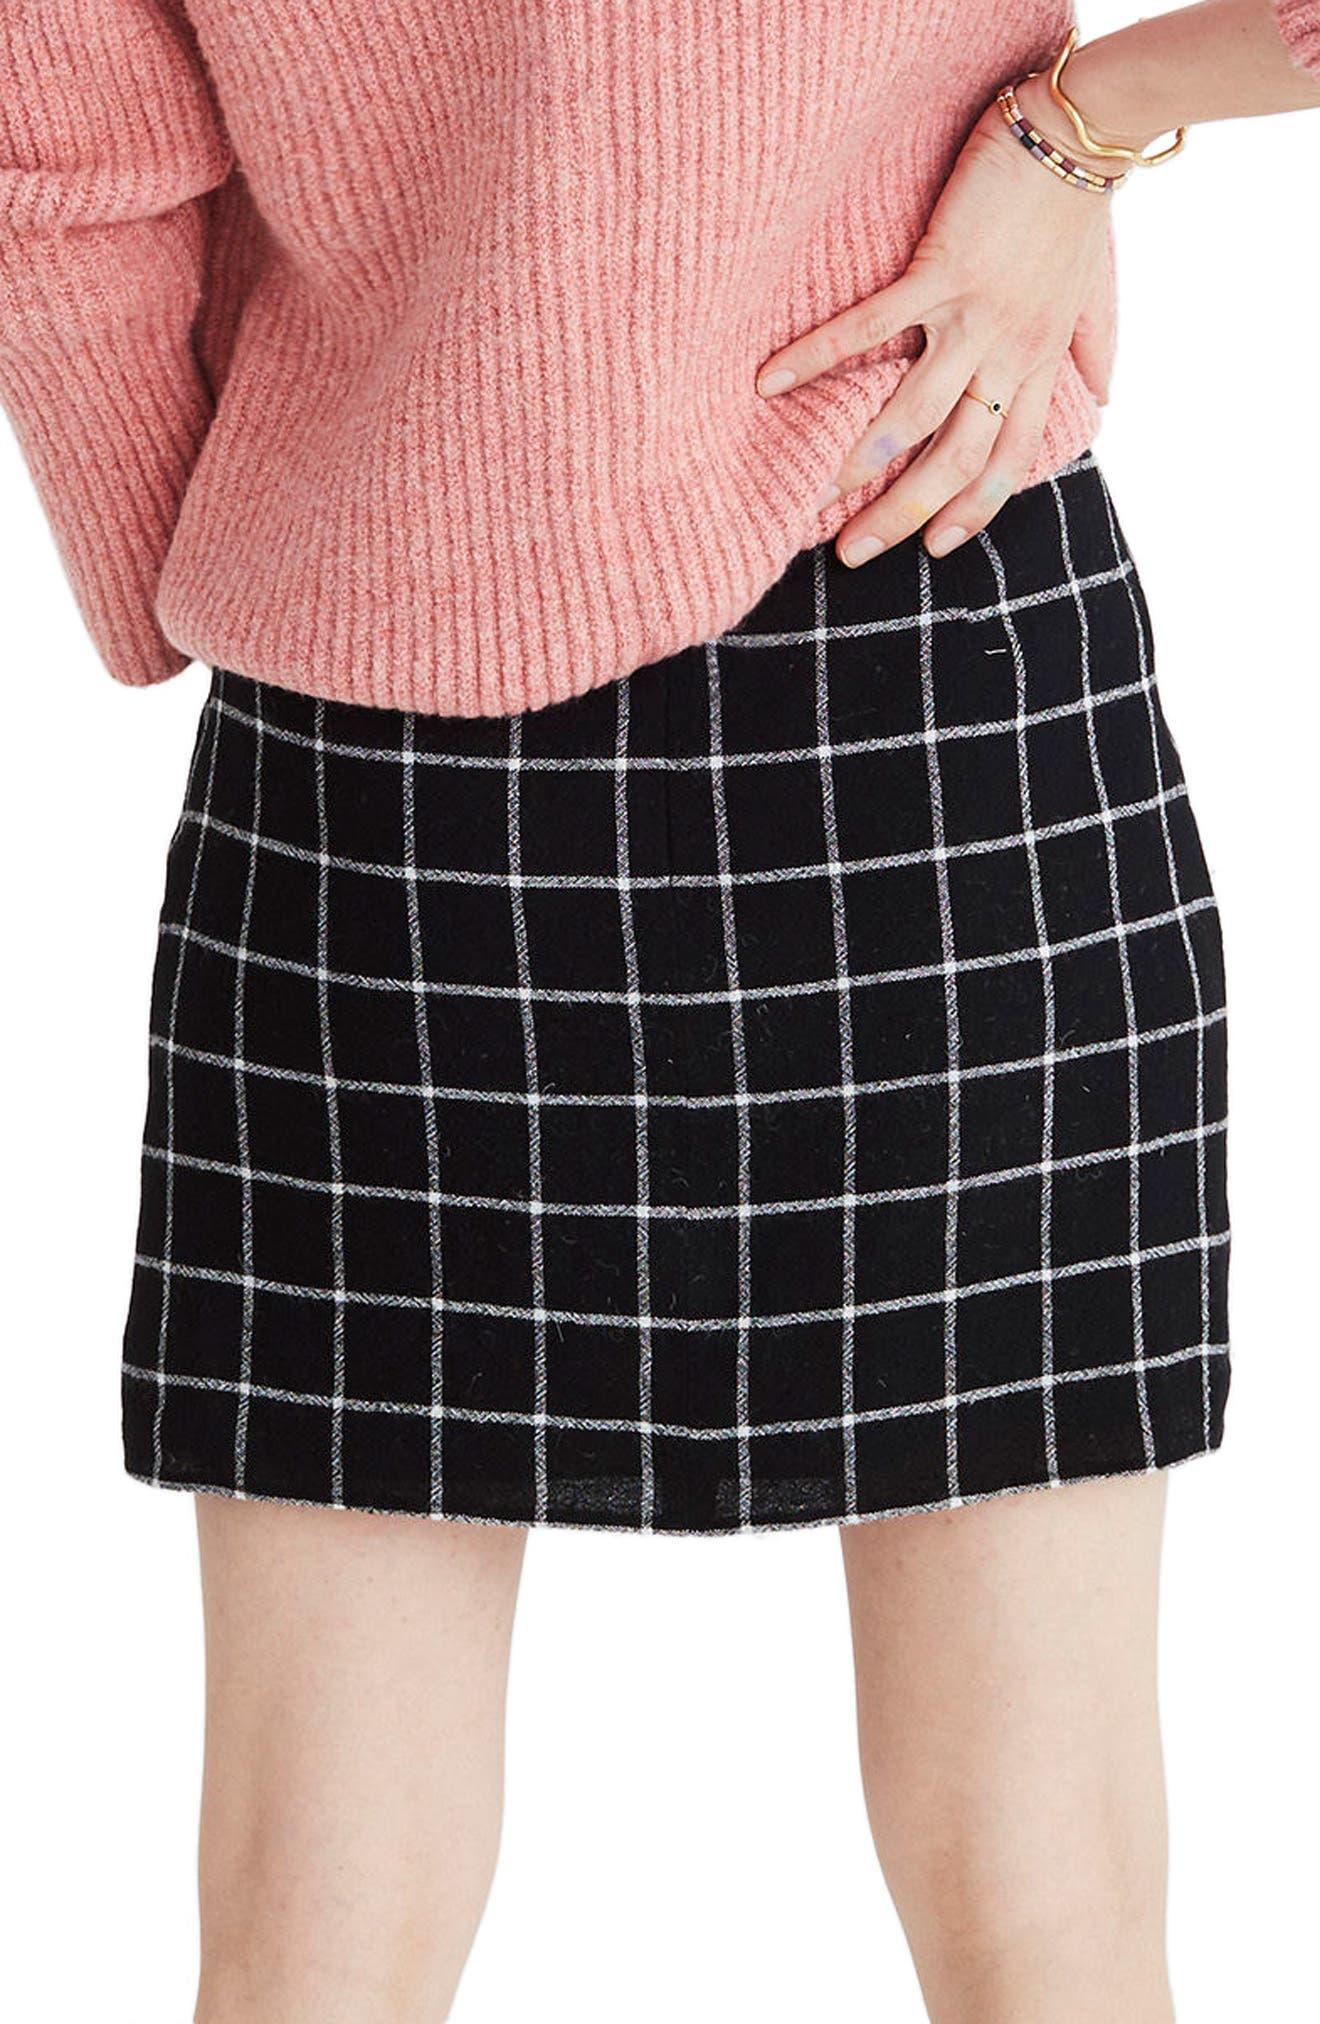 MADEWELL, Windowpane Ruffle Front Miniskirt, Alternate thumbnail 2, color, 009